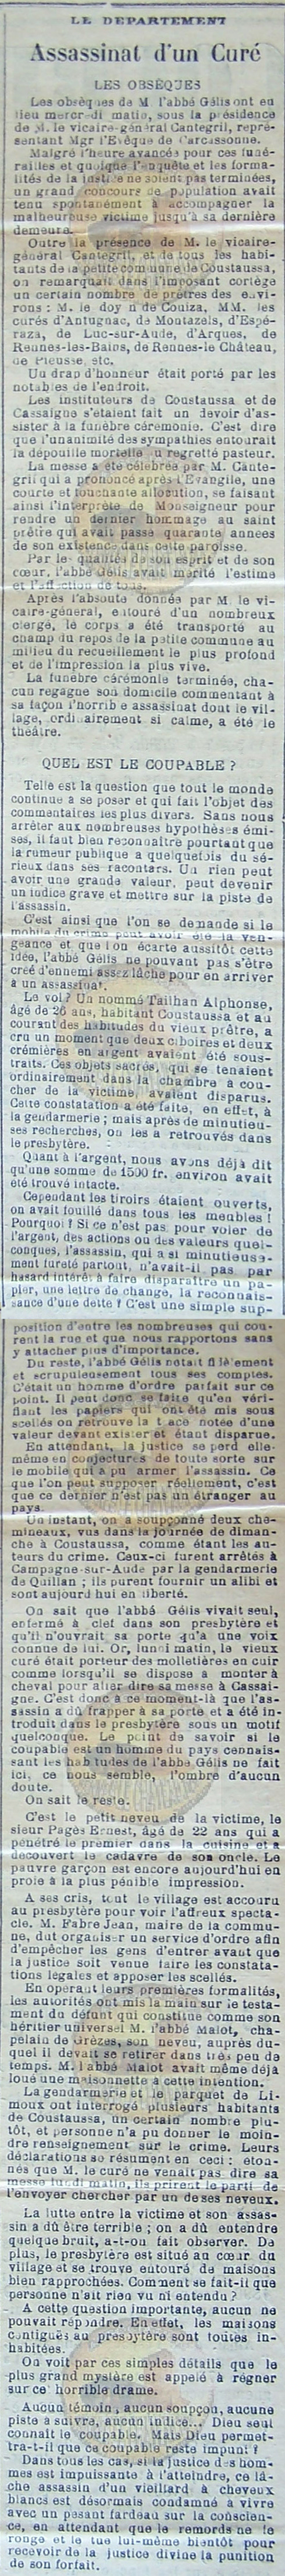 05-11-1897 Assassinat d'un curé